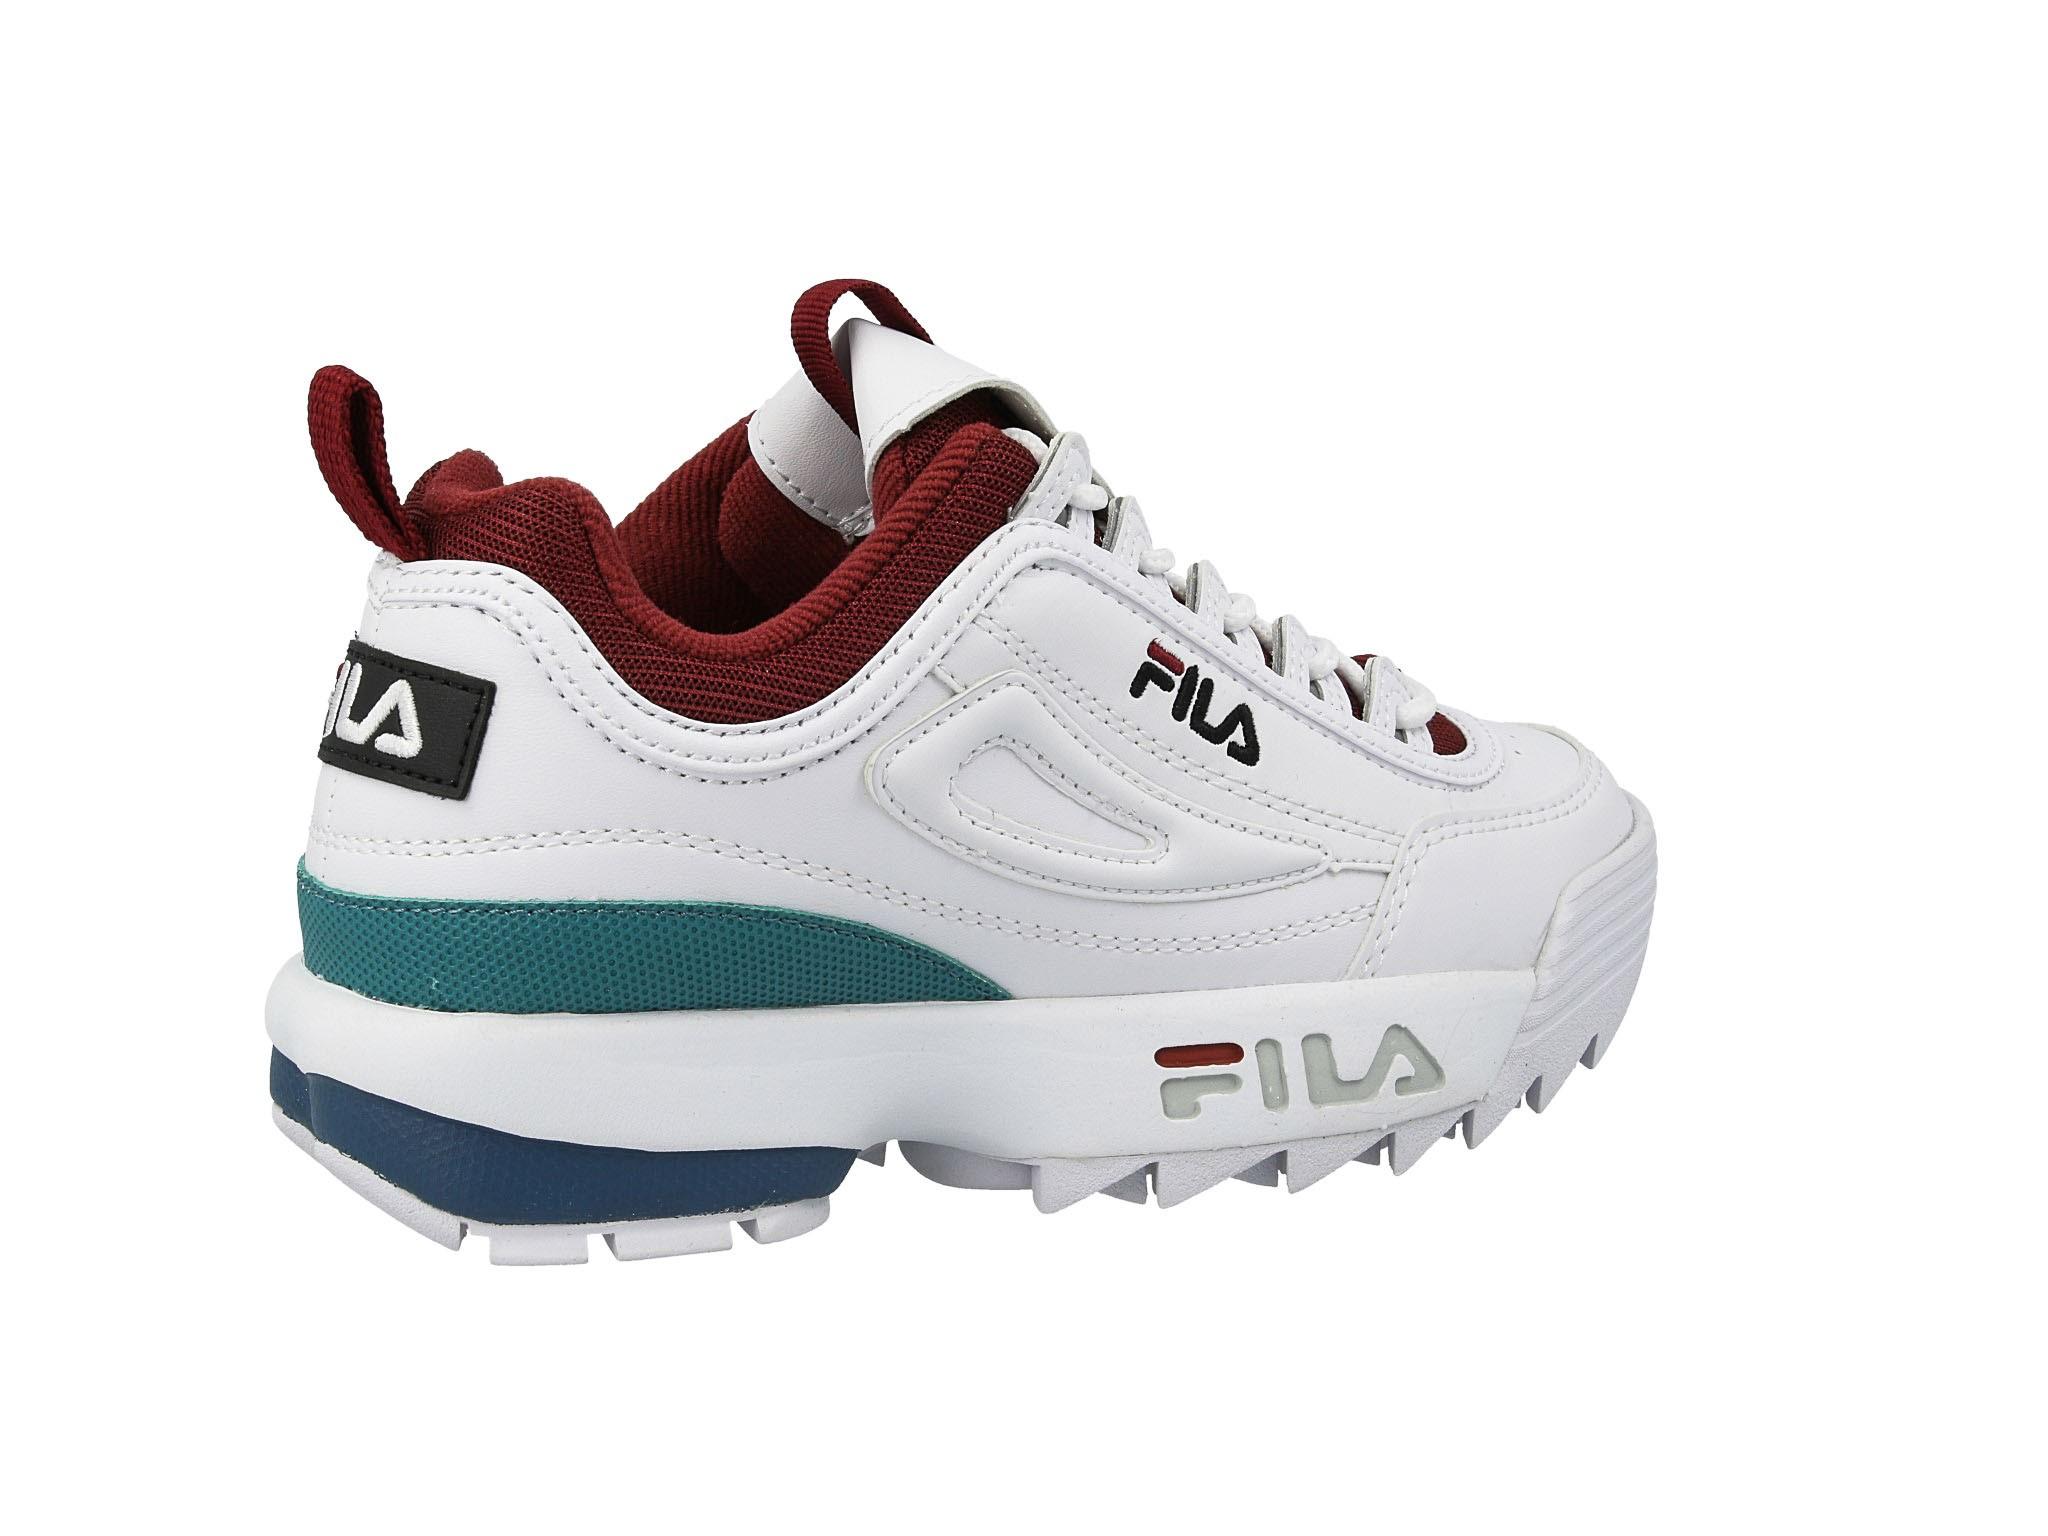 FILA Fila Disruptor CB Low Sneakersy Damskie 1010604.02H